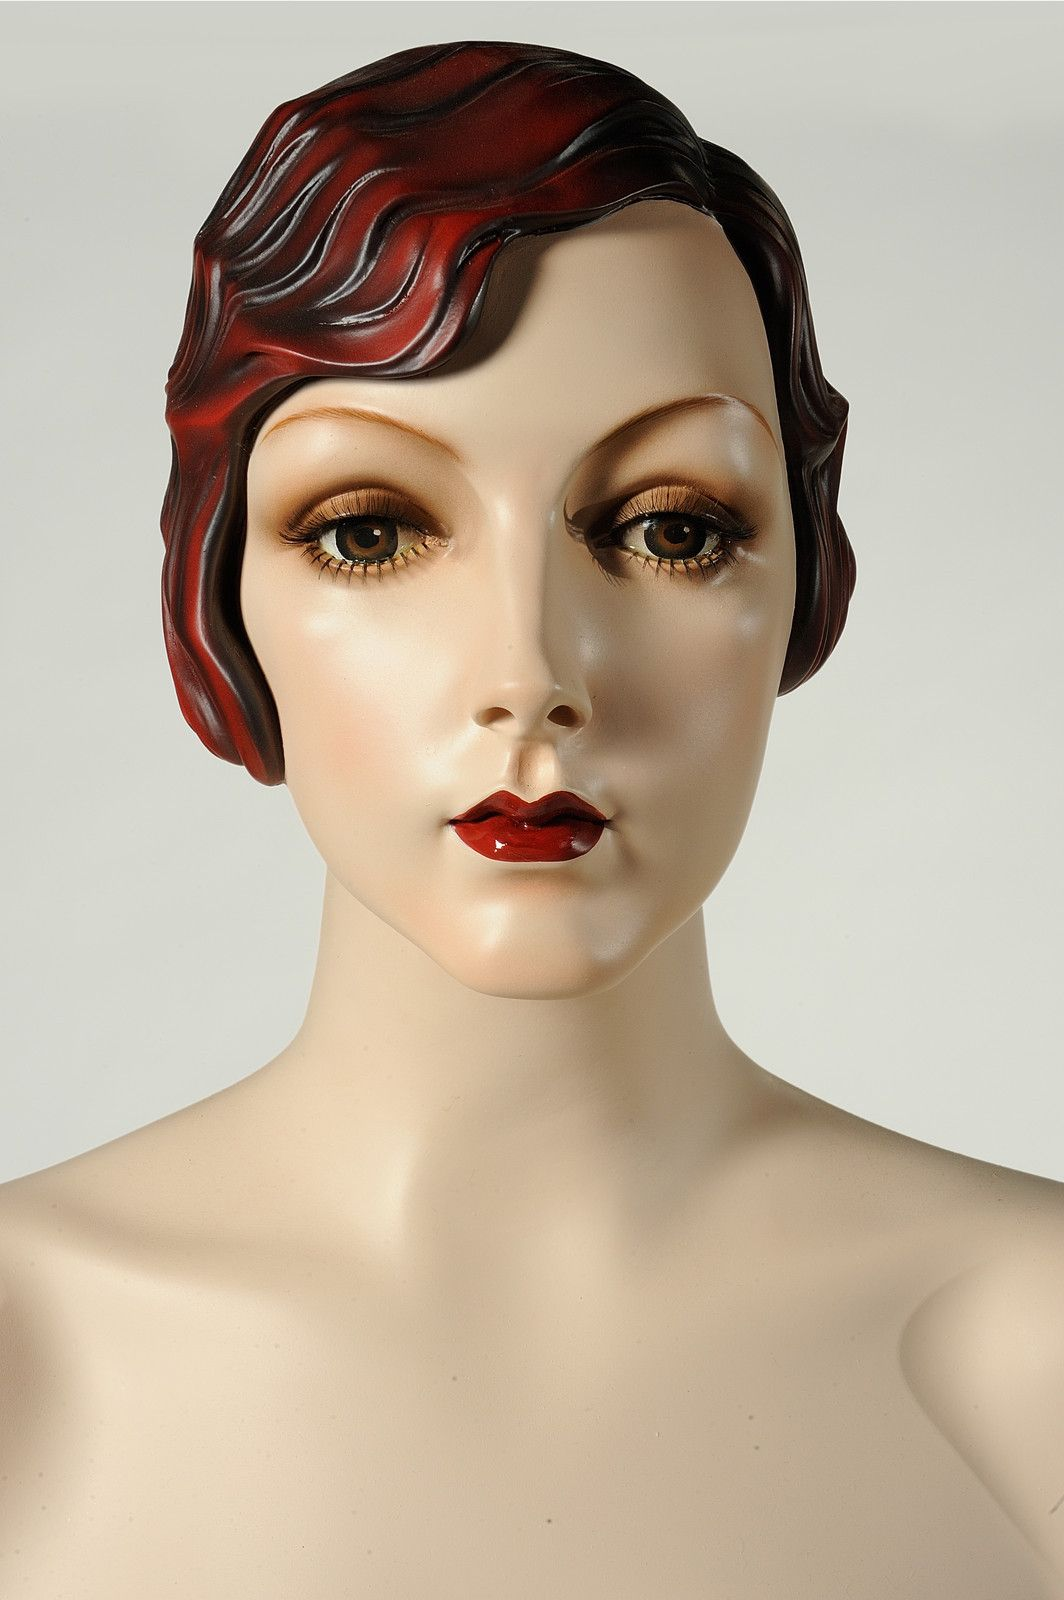 mannequin Vintage female